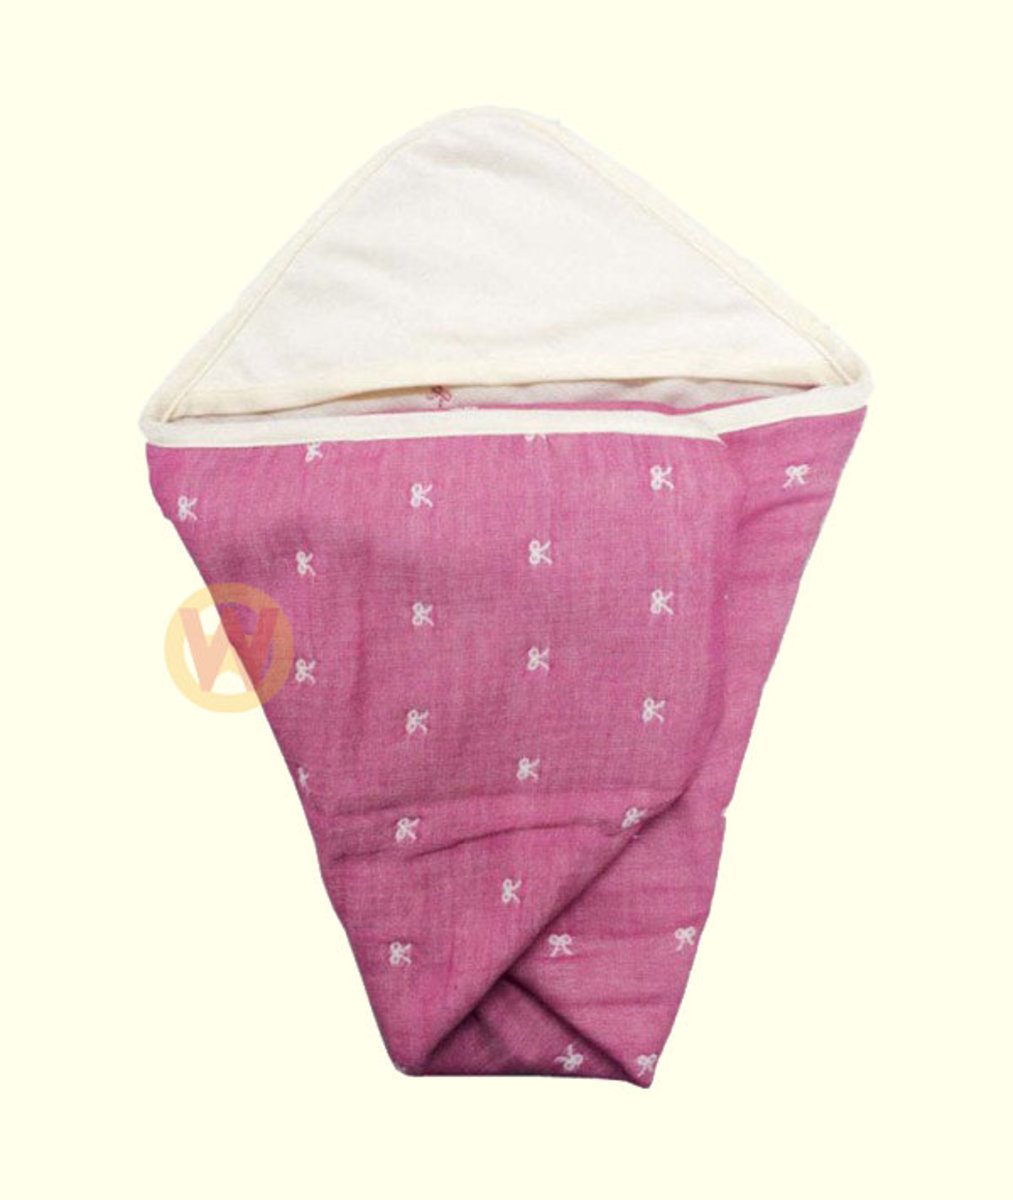 ETOFFA 日本製6重紗包布 粉紅蝴蝶 [平行進口]